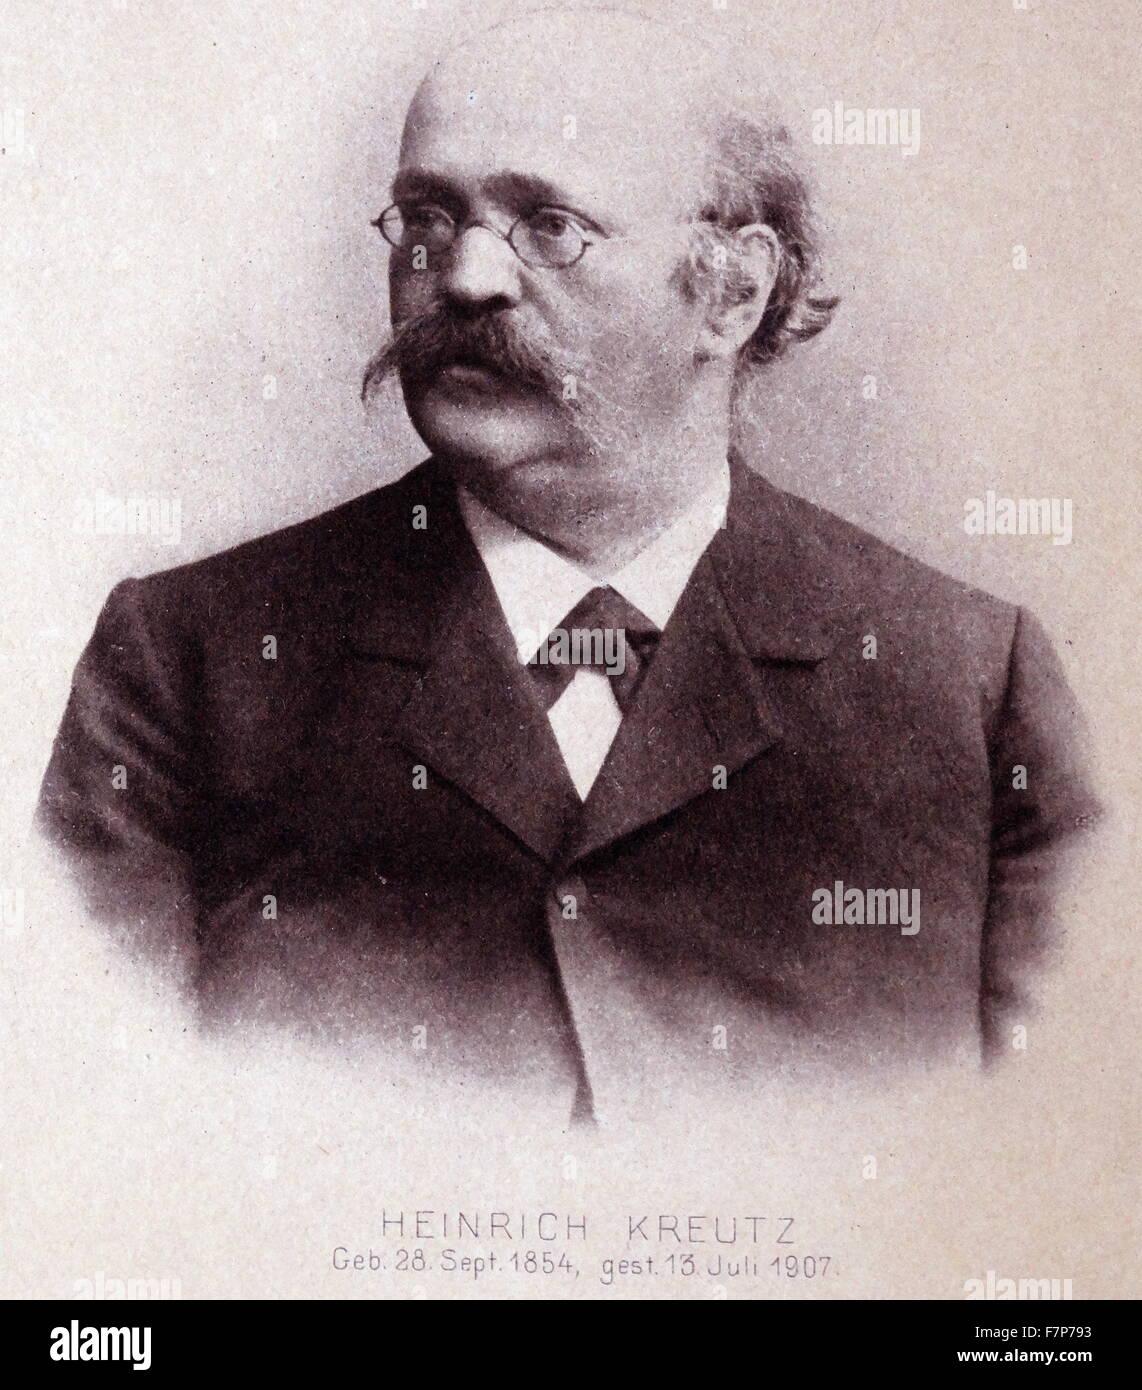 Heinrich KREUTZ 1854-1907 (German astronomer) - Stock Image